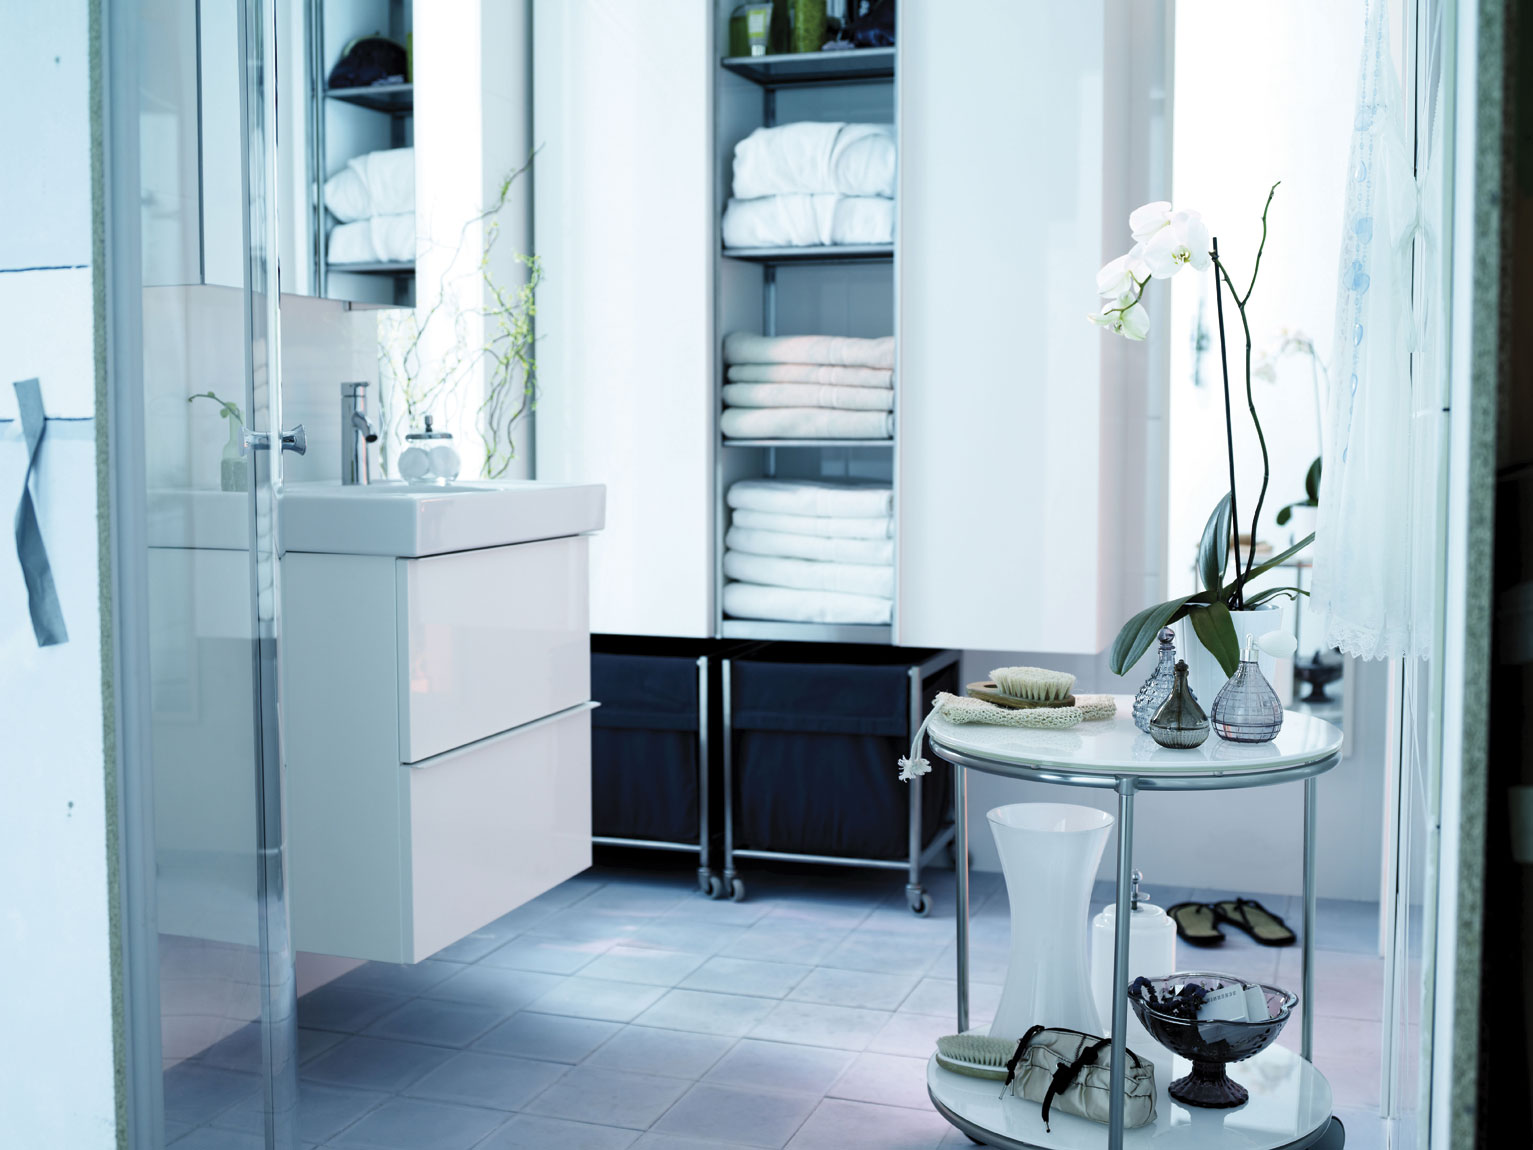 Ba os ikea 2013 - Ikea muebles auxiliares de bano ...